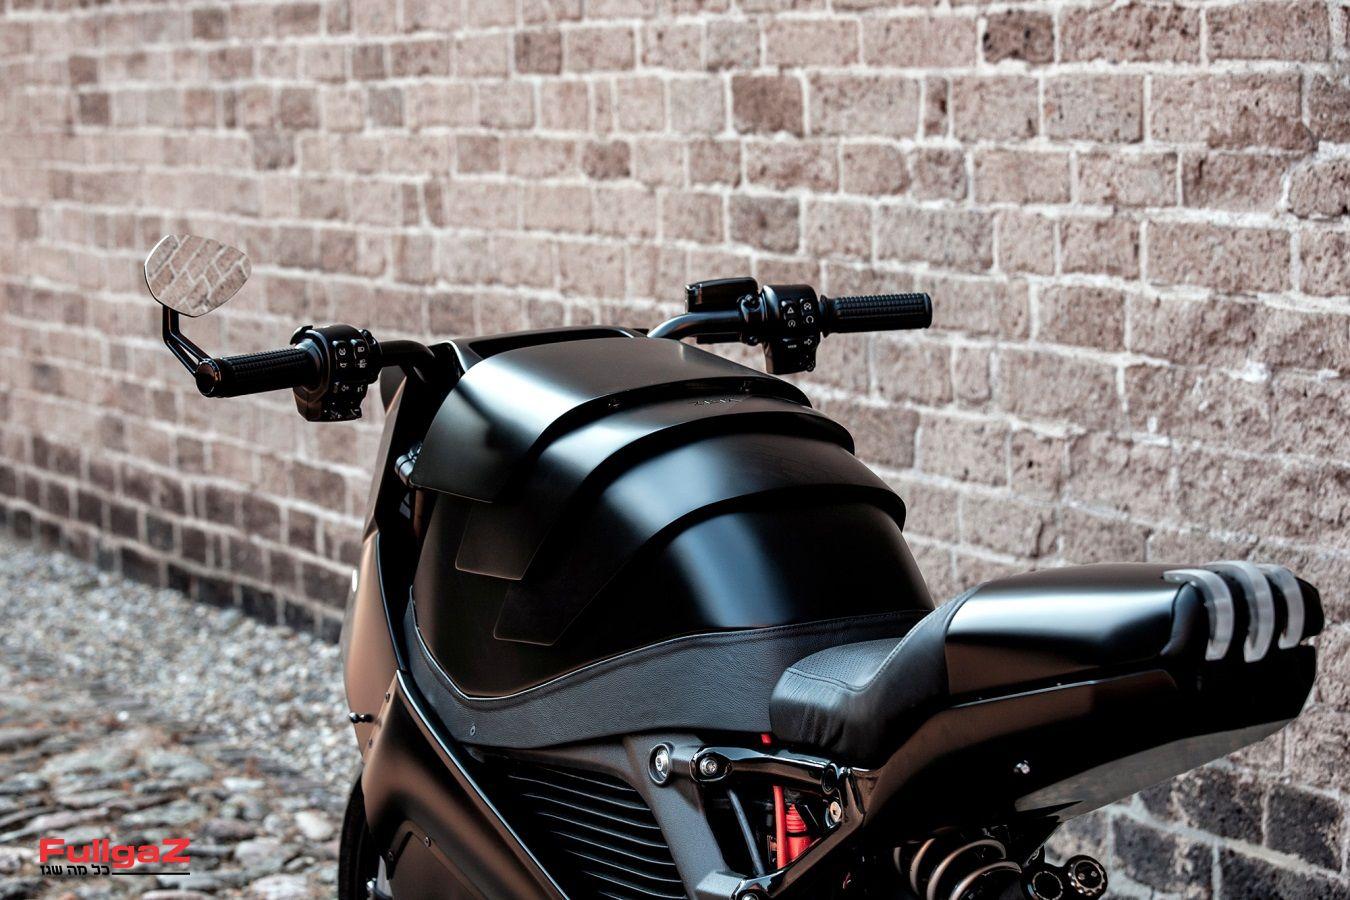 Moto-Adonis-harley-davidson-livewire-custom-9